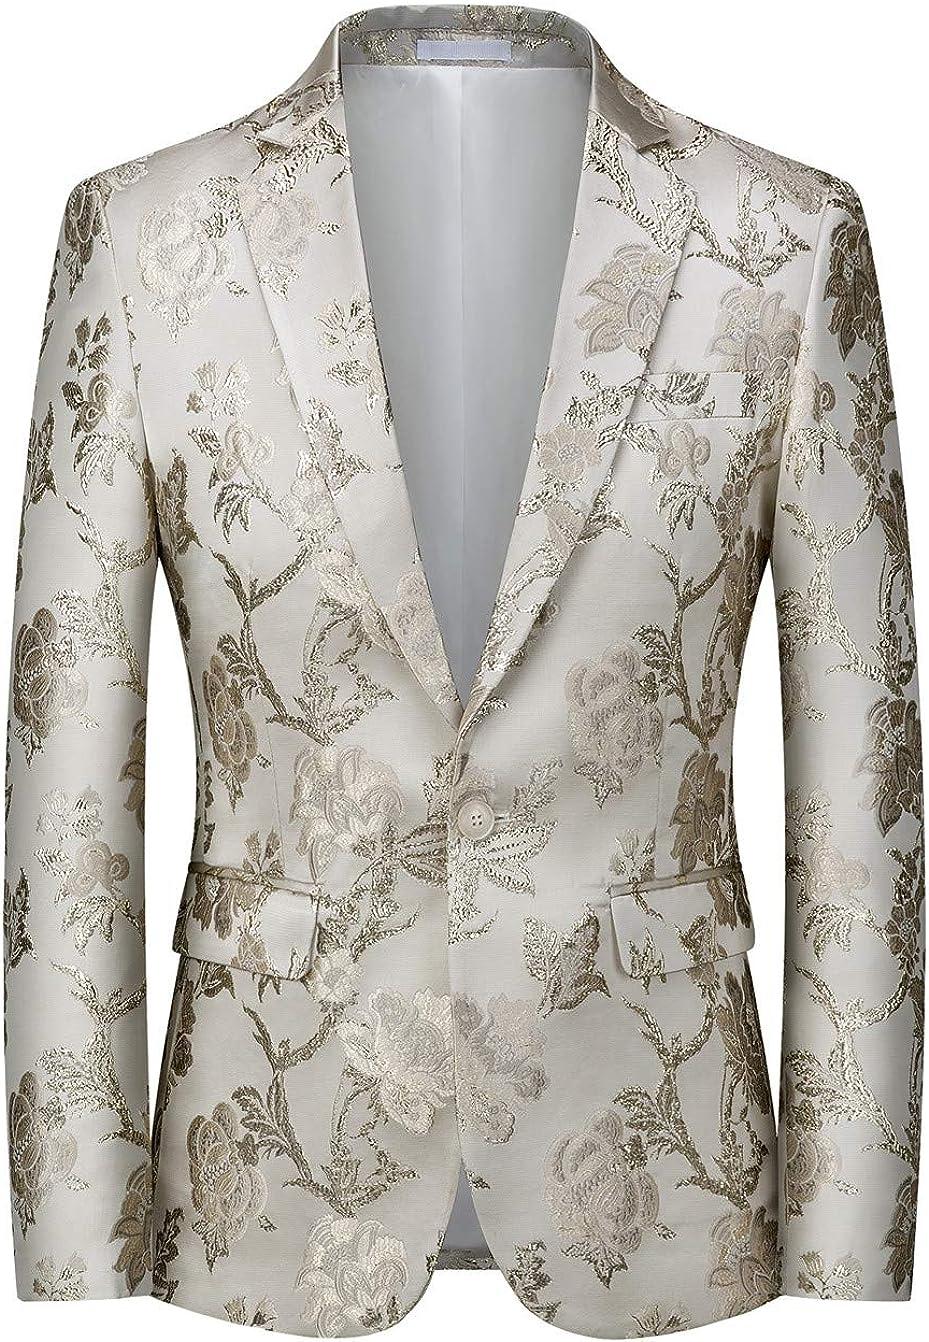 MOGU Mens Metallic 新色追加して再販 Jacquard Blazer Fit Elegant Suit 当店一番人気 Slim Tuxedo